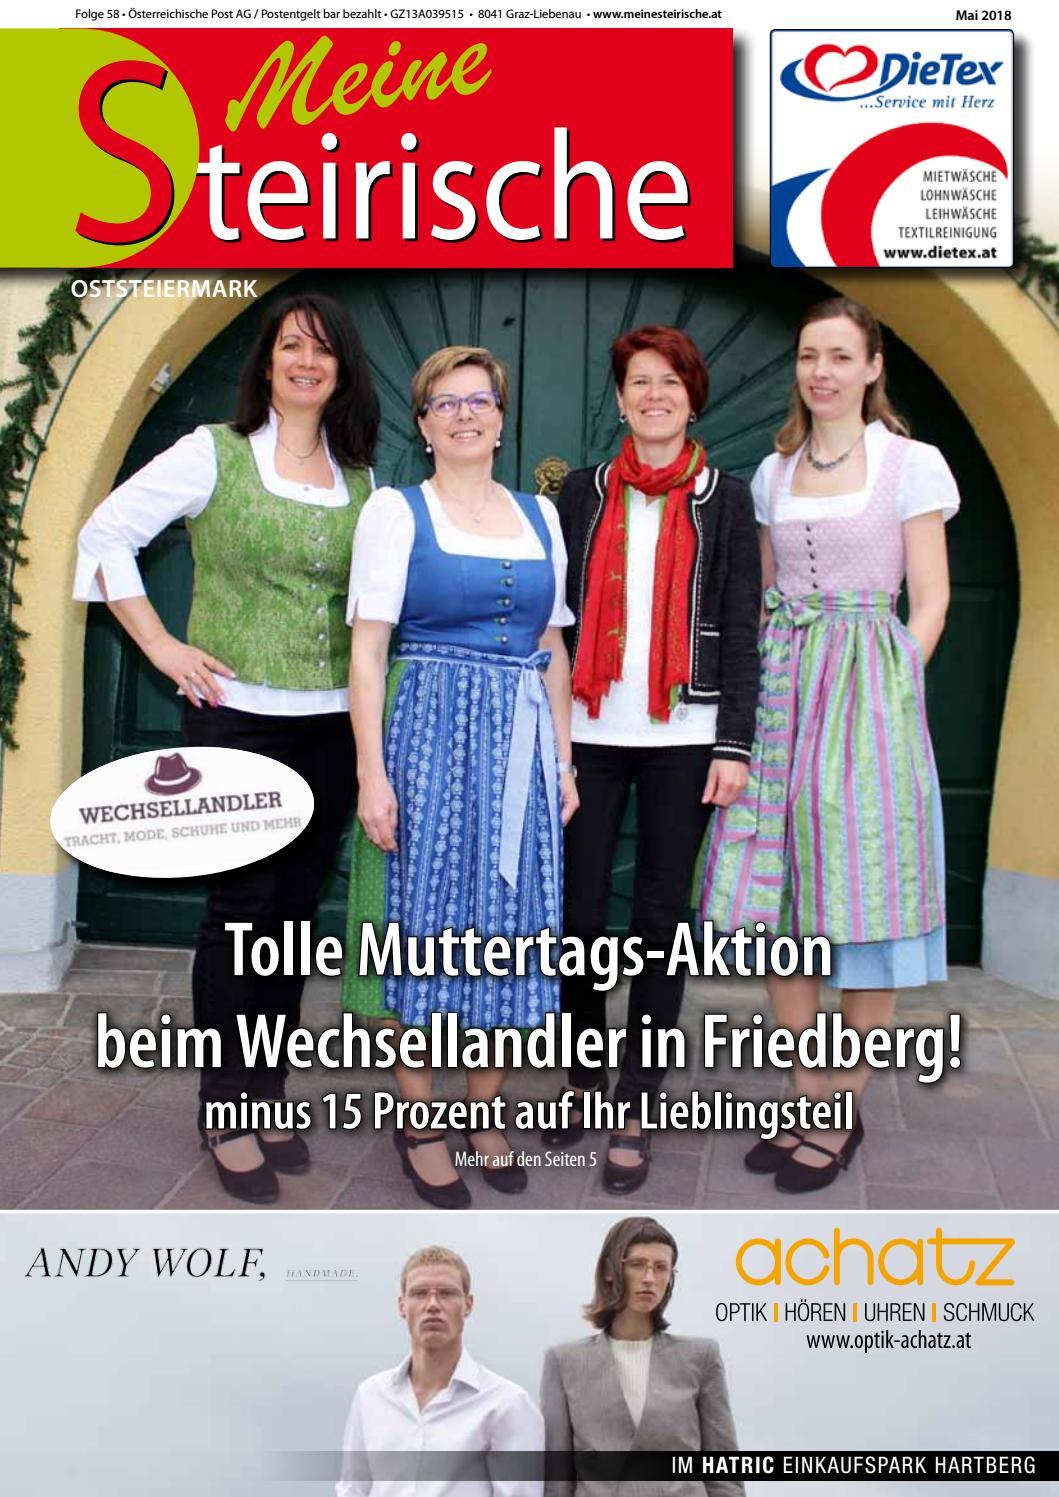 Hartberg singletreff ab 50 Treffen in gunskirchen